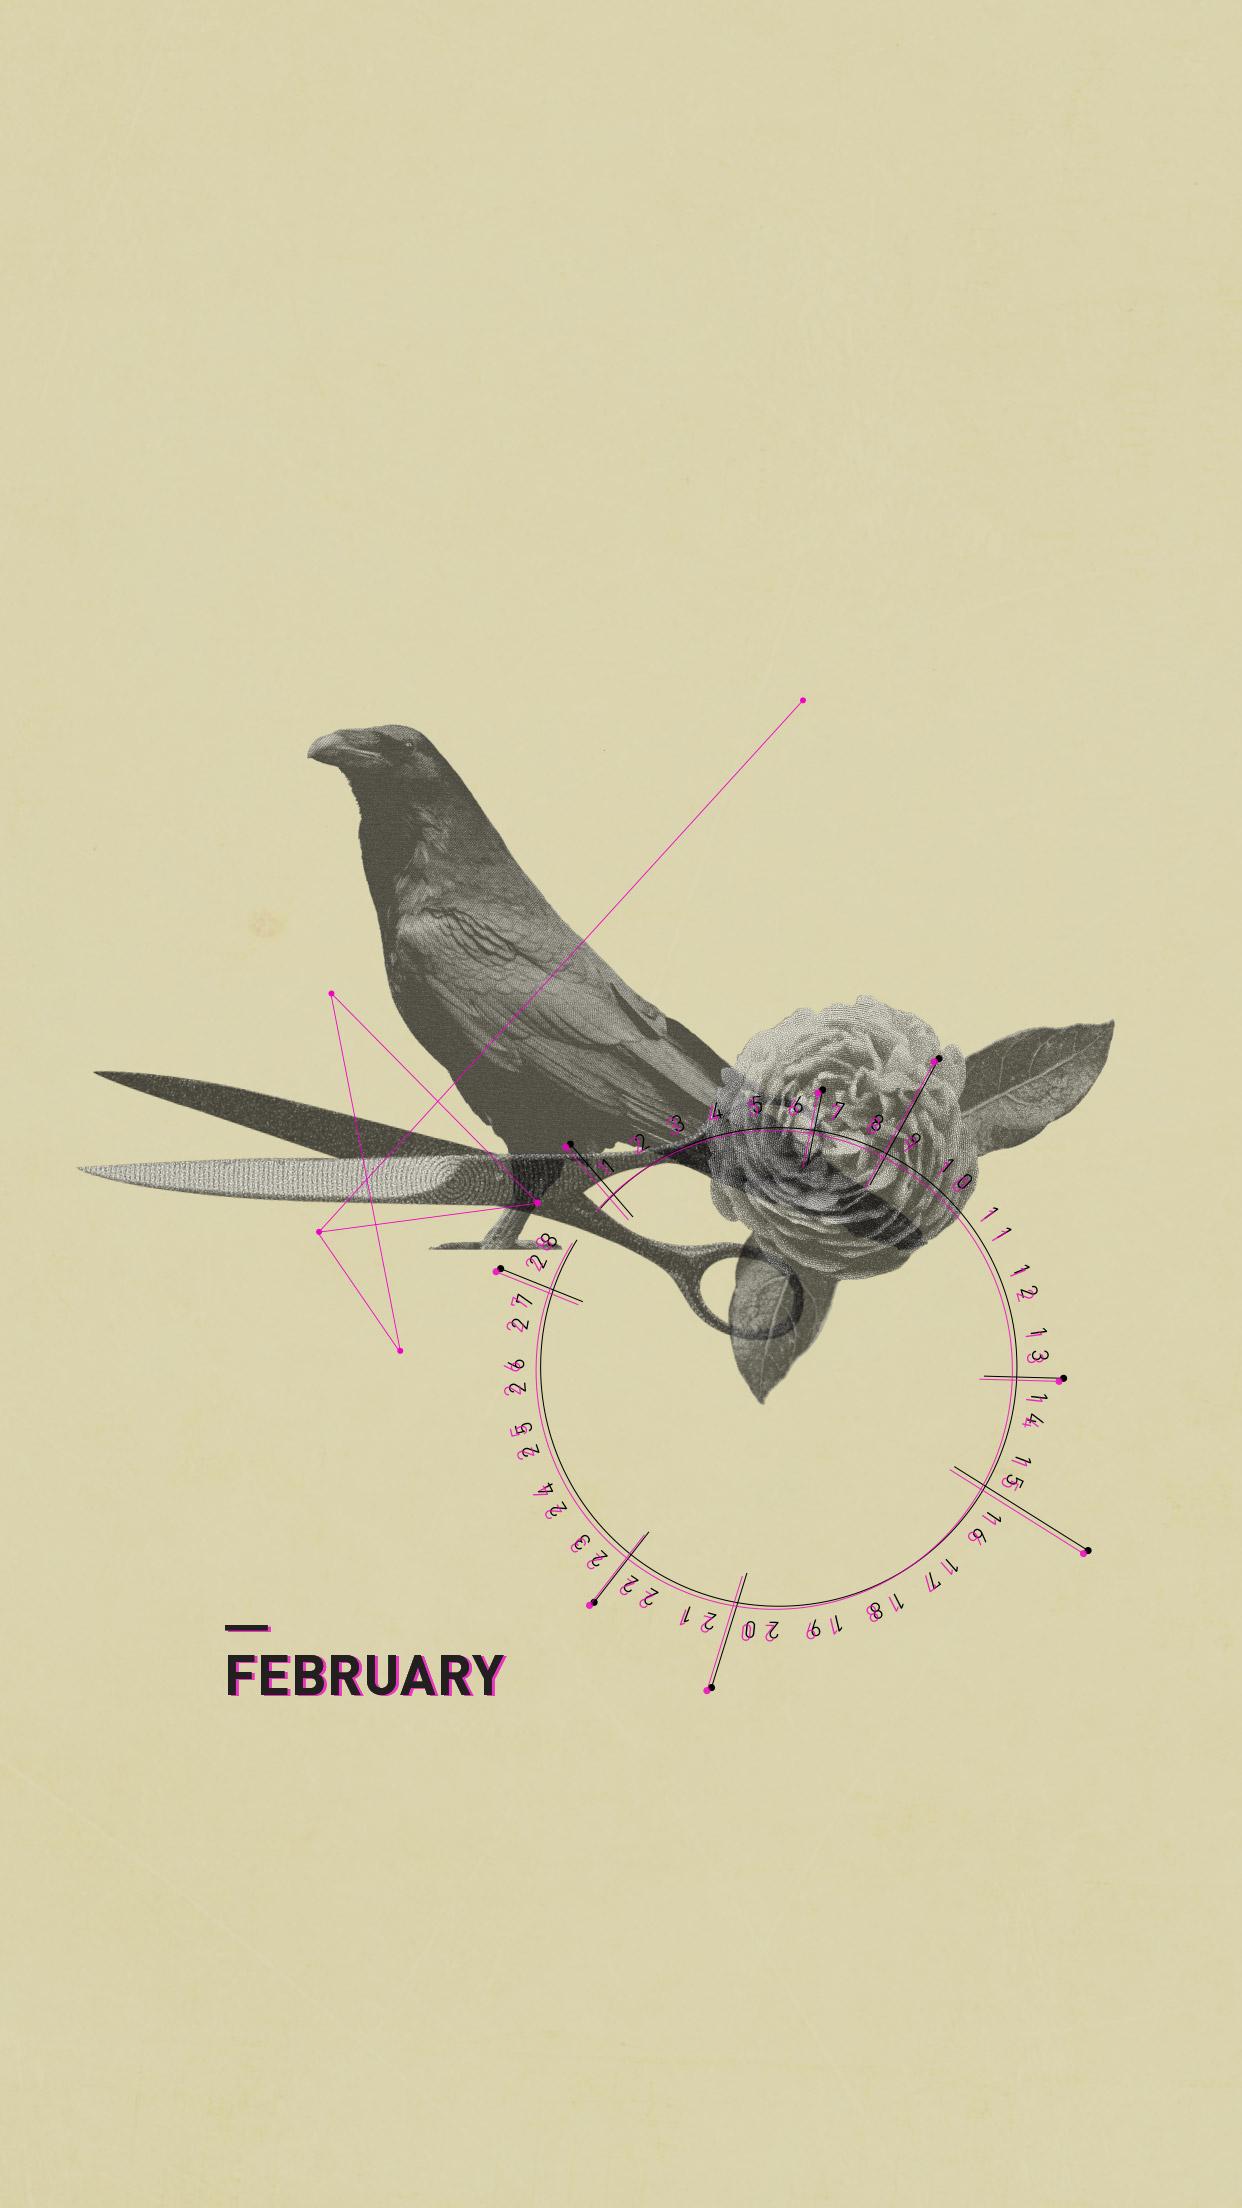 February 2015 Desktop Calendar Wallpaper Paper Leaf 1242x2208